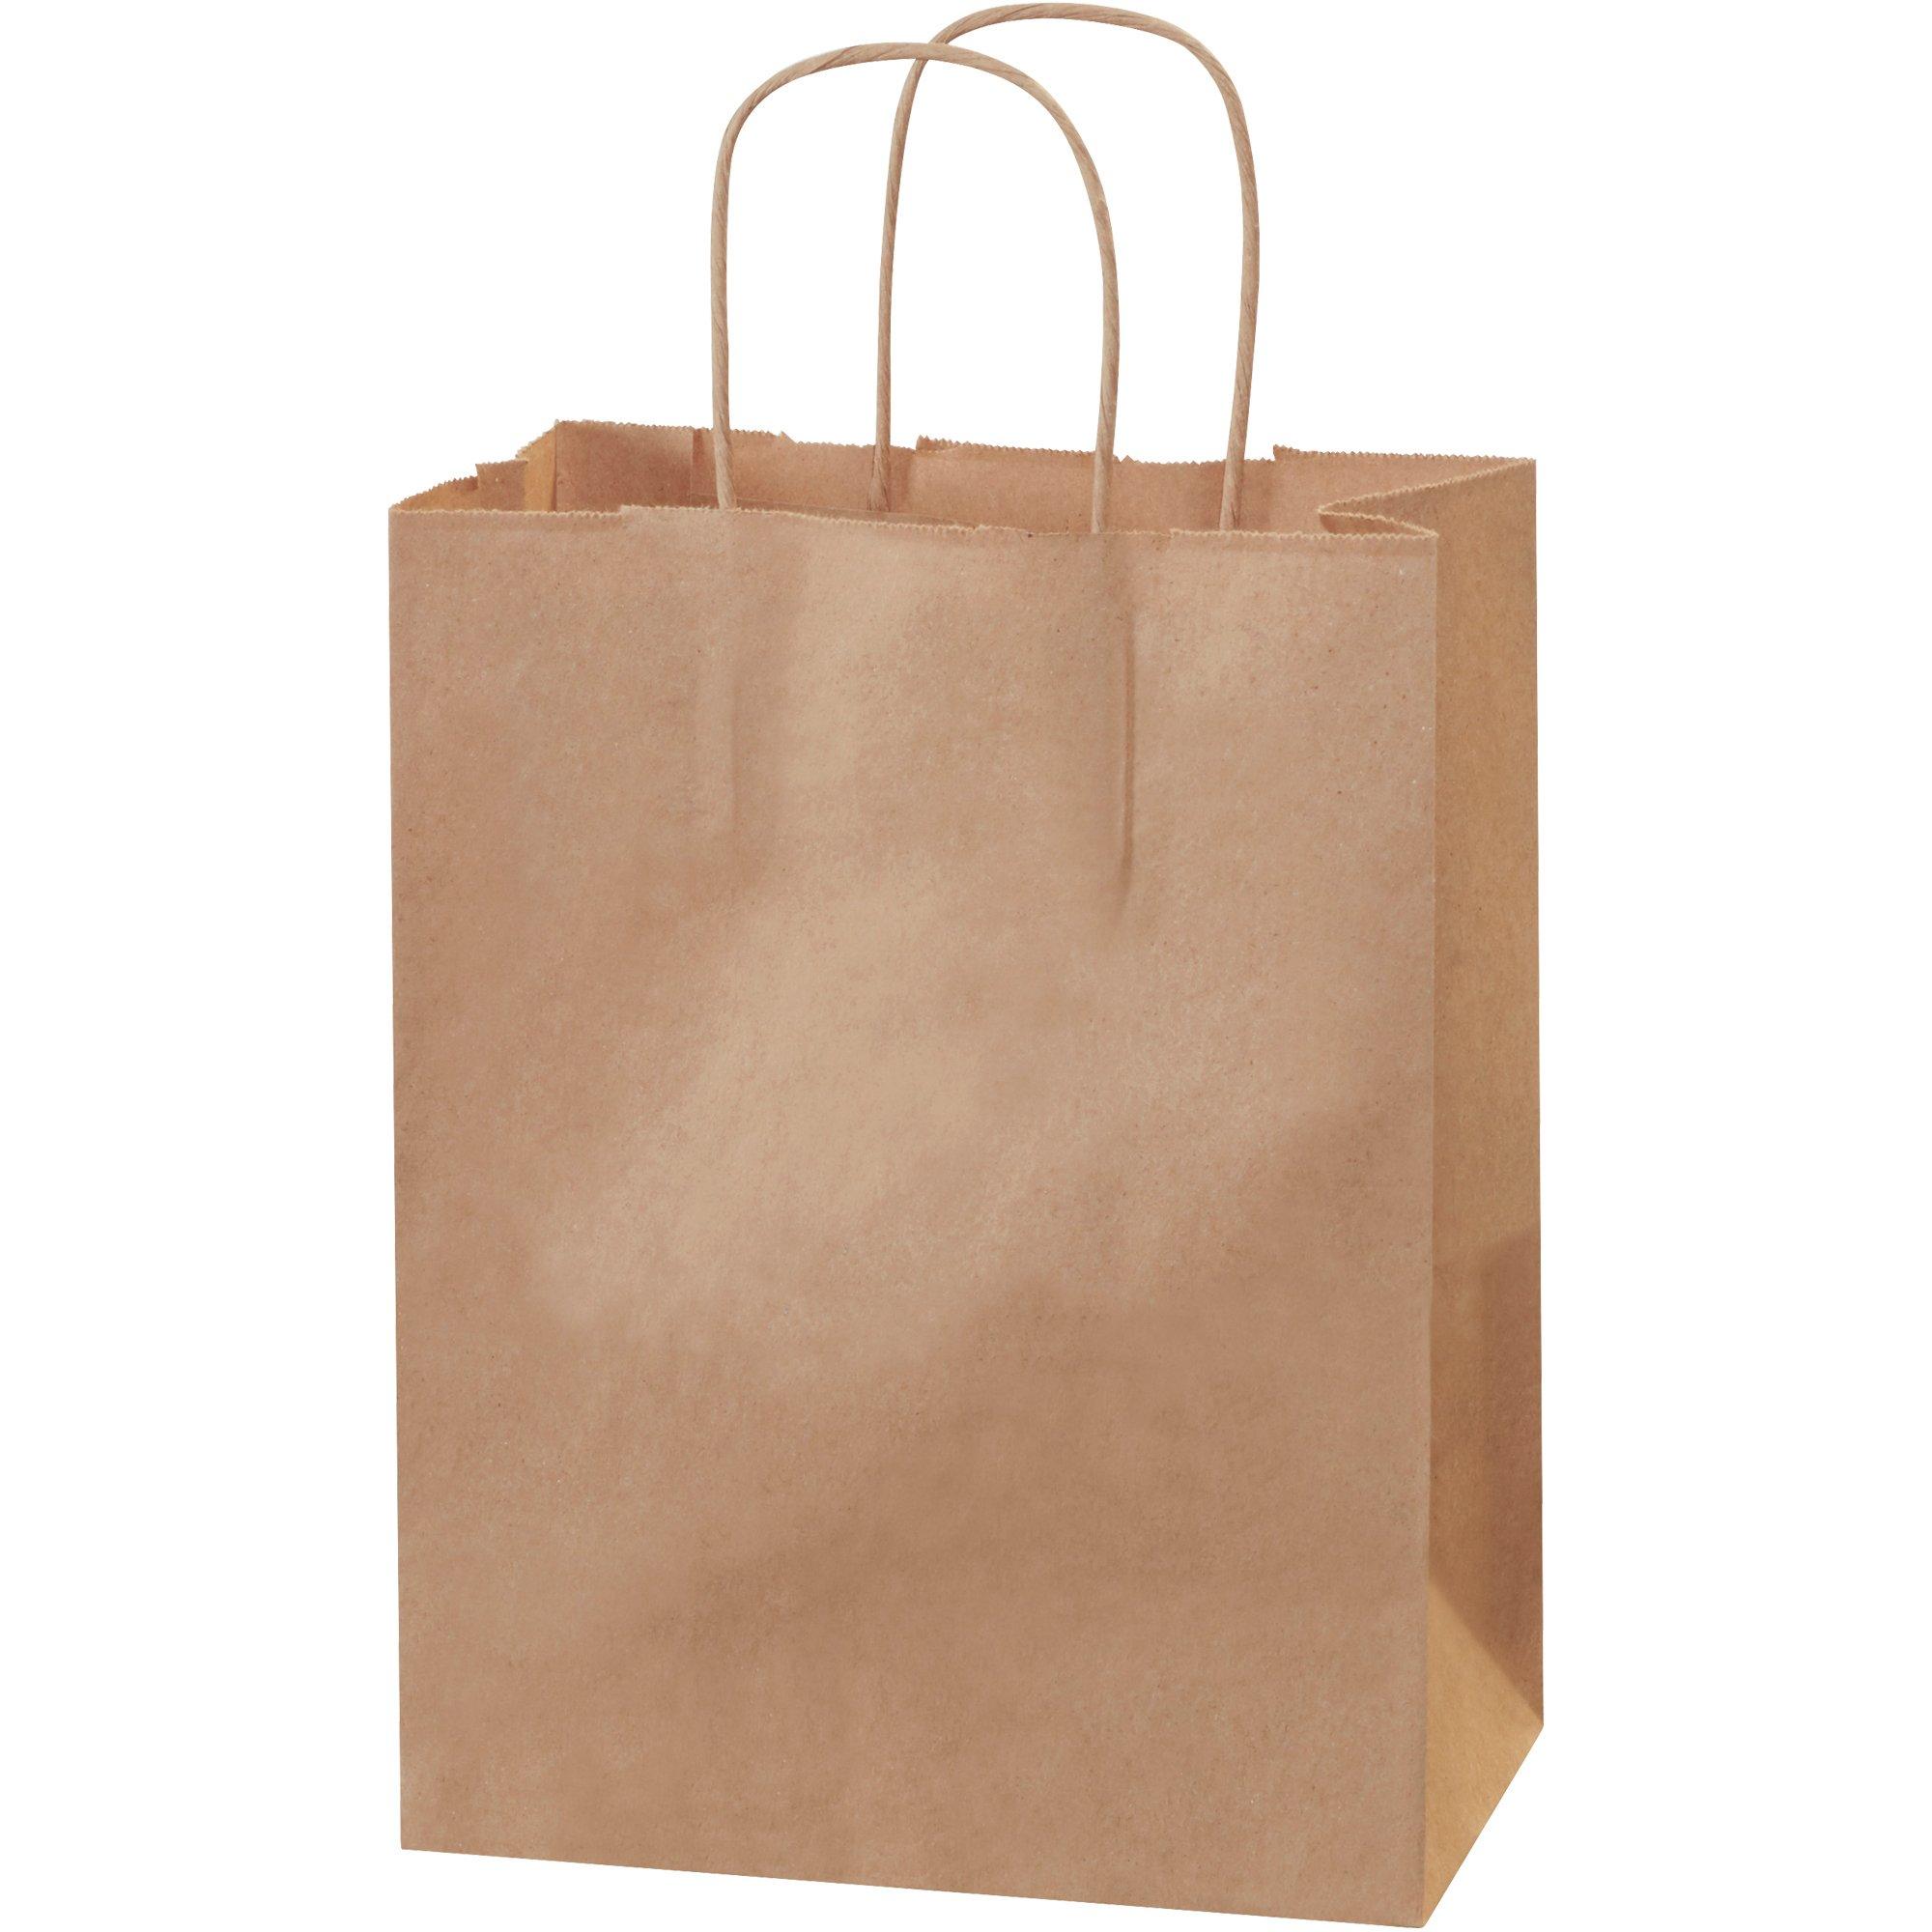 Paper Shopping Bags, 8'' x 4 1/2'' x 10 1/4'', Kraft, 250/Case